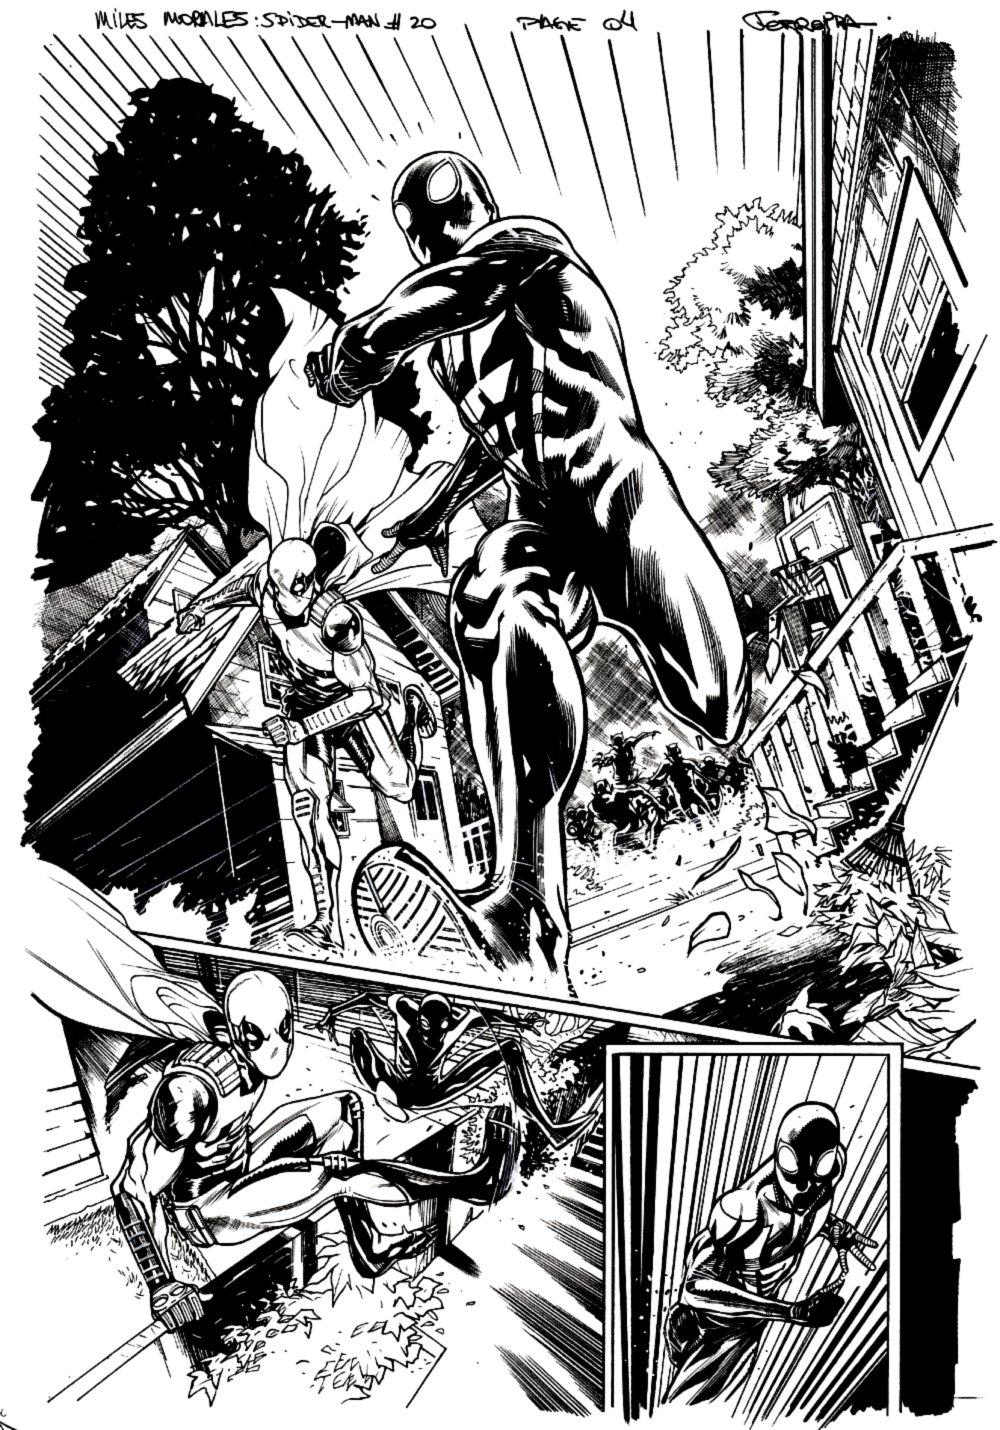 Miles Morales: Spider-Man #20 p 4 Semi-Splash (Spider-Man & Prowler!) 2020